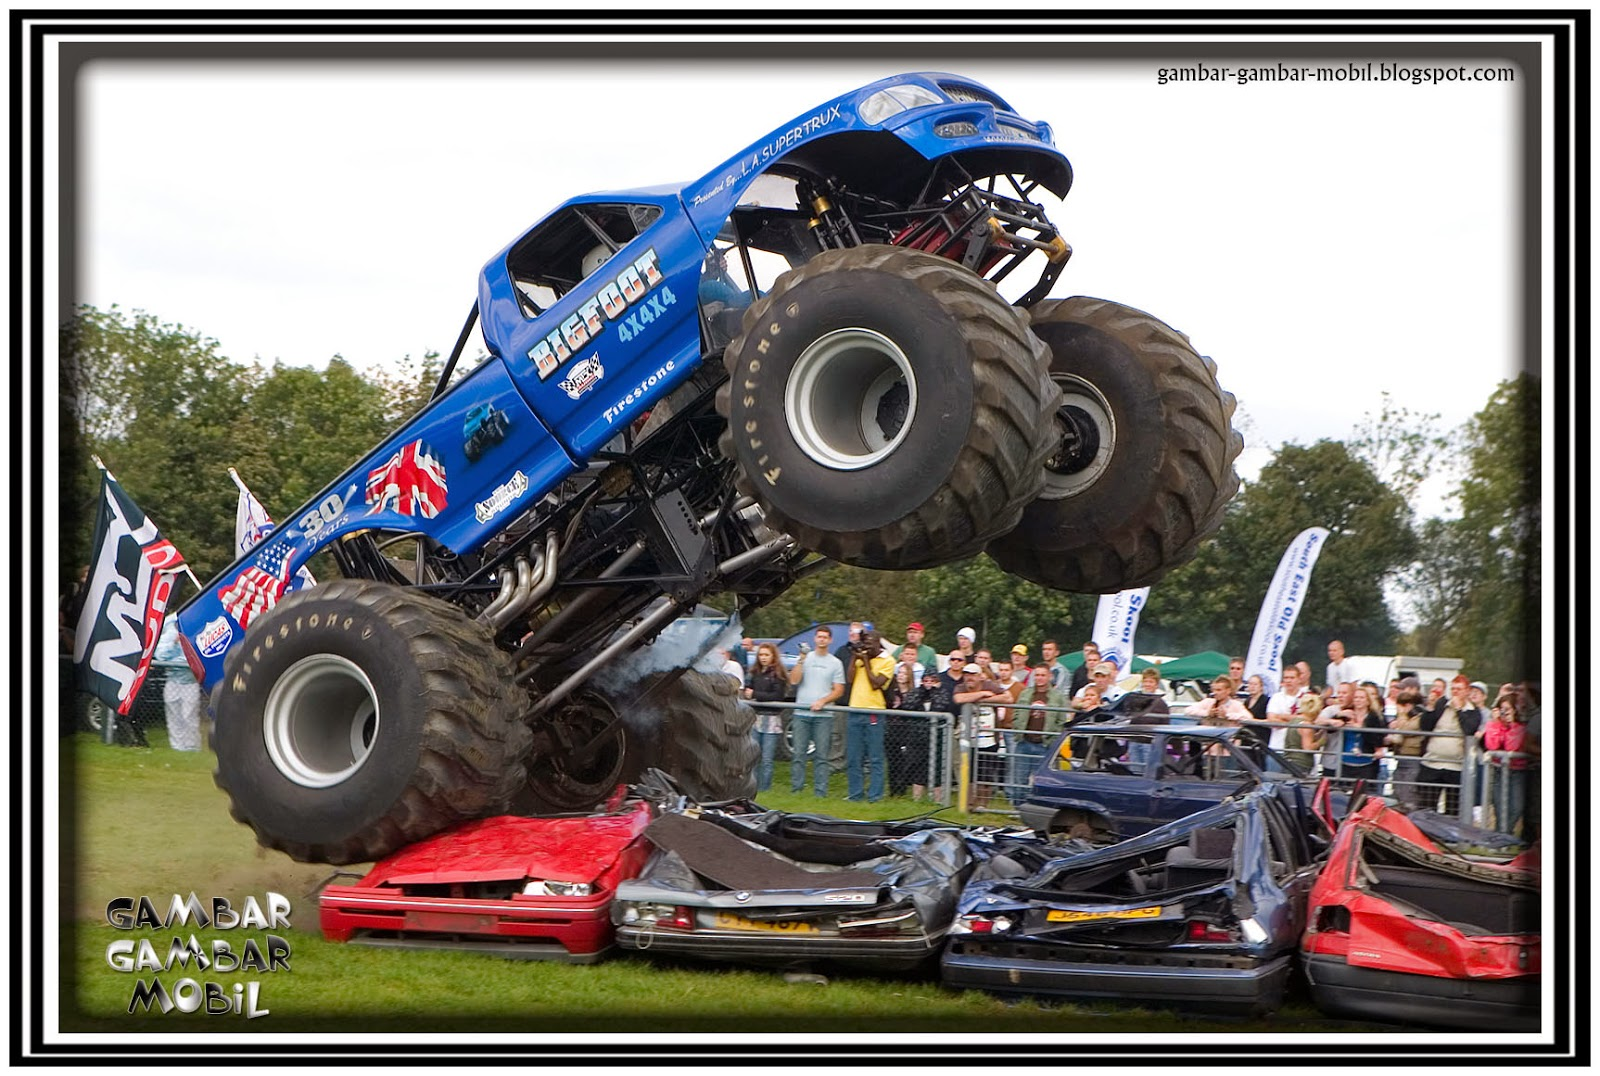 foto mobil truk balap